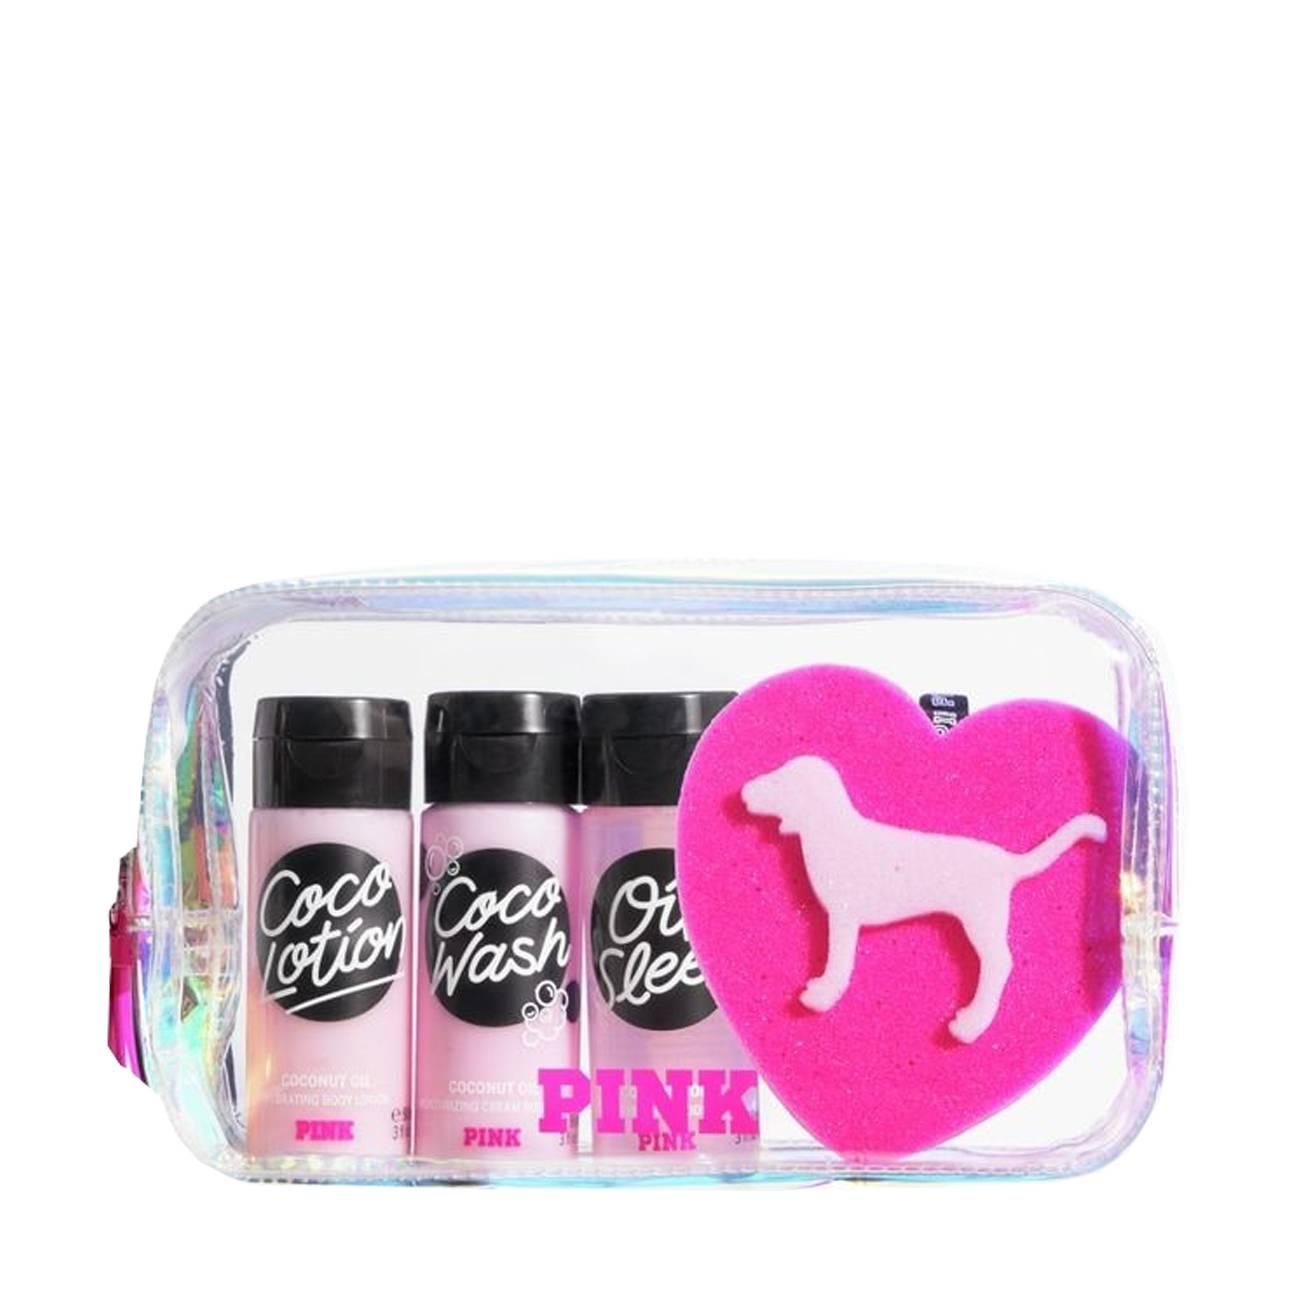 Pink Set 267 Ml Victoria's Secret imagine 2021 bestvalue.eu